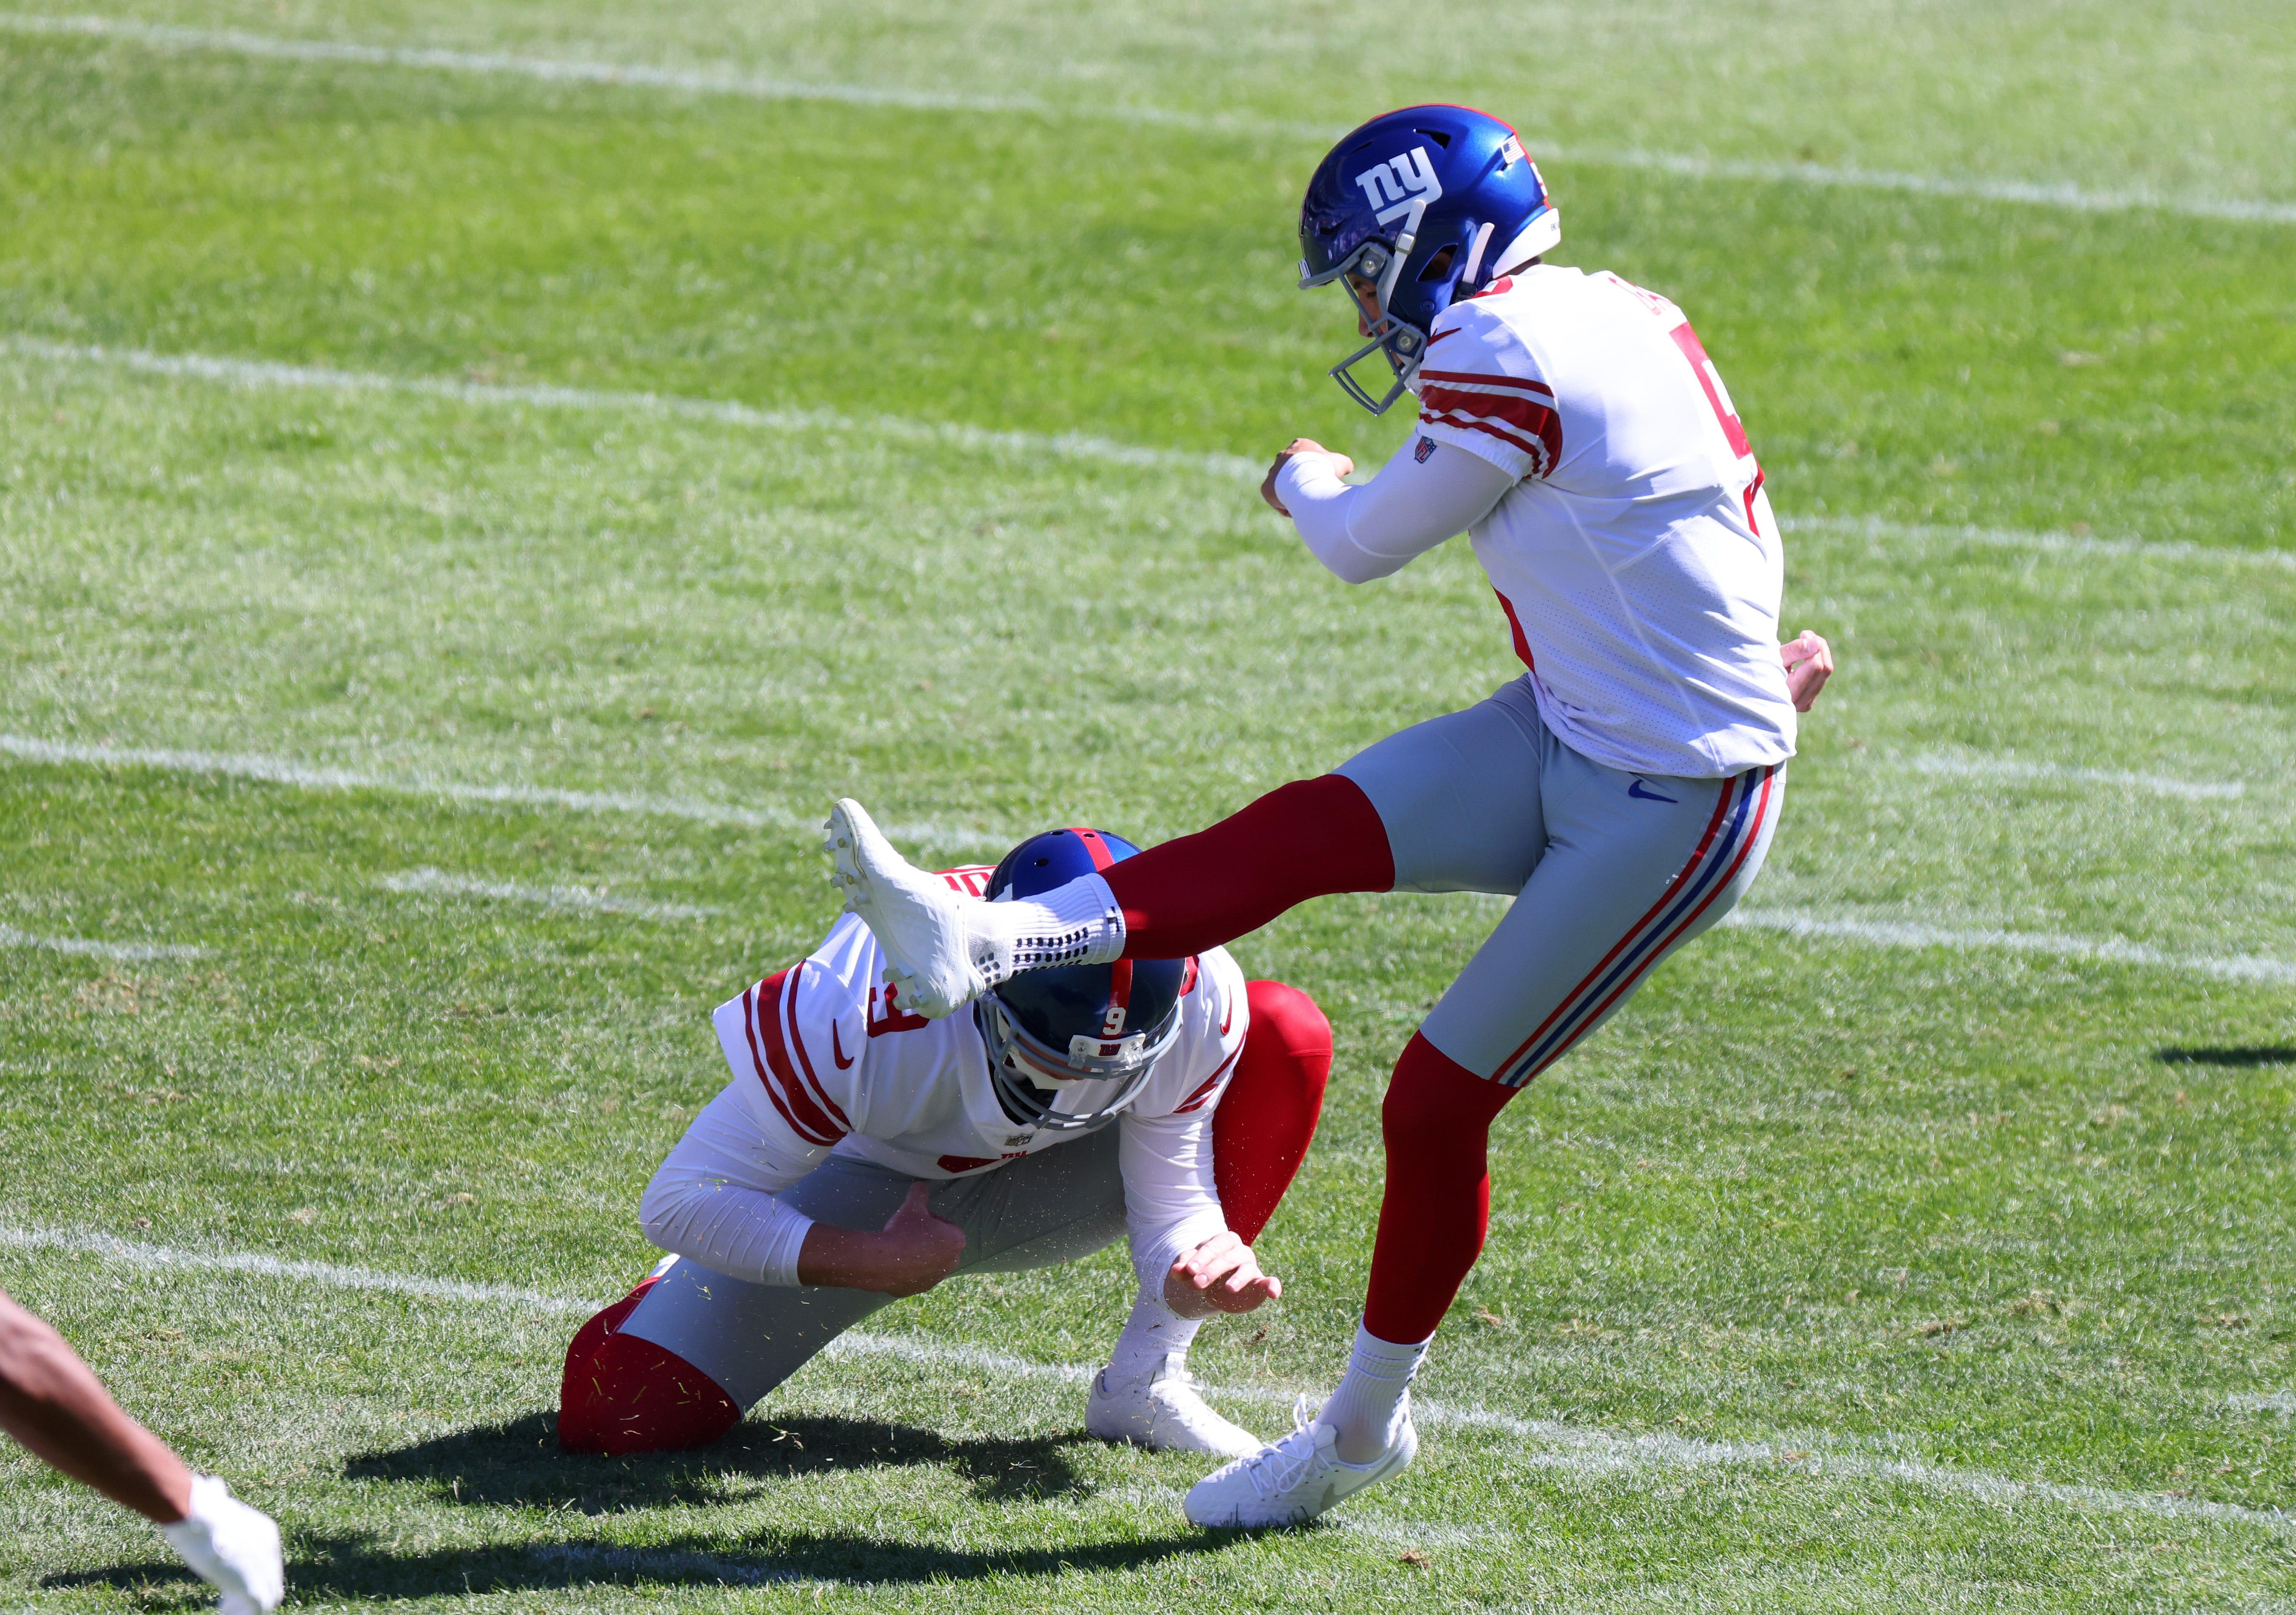 Nfl Covid 19 Updates Giants Kicker Graham Gano Tests Positive